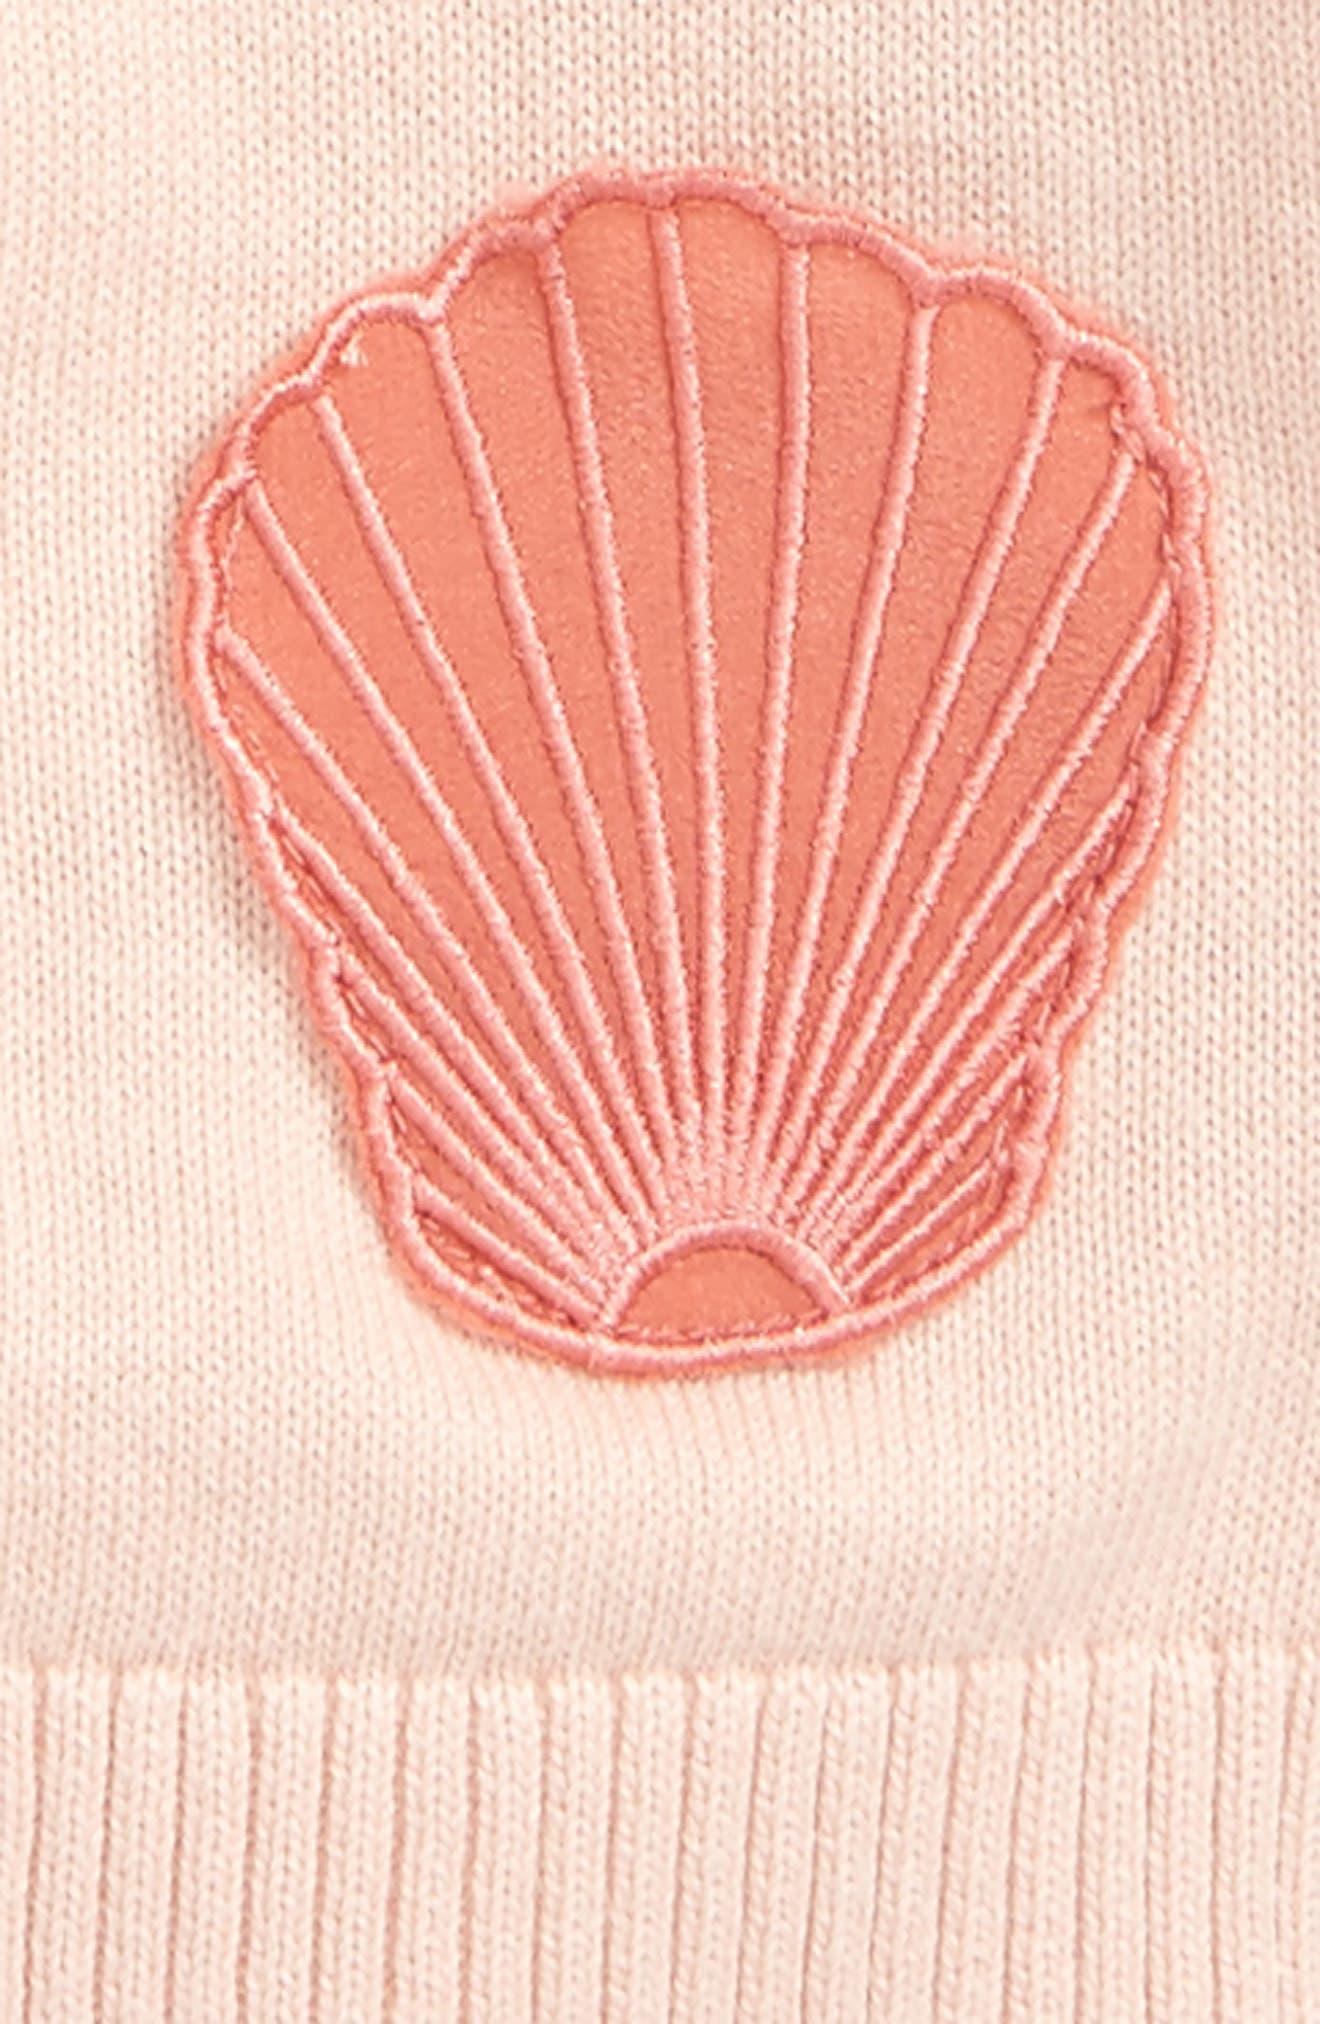 Lauren Seashell Patch Cardigan,                             Alternate thumbnail 2, color,                             Dusky Rose